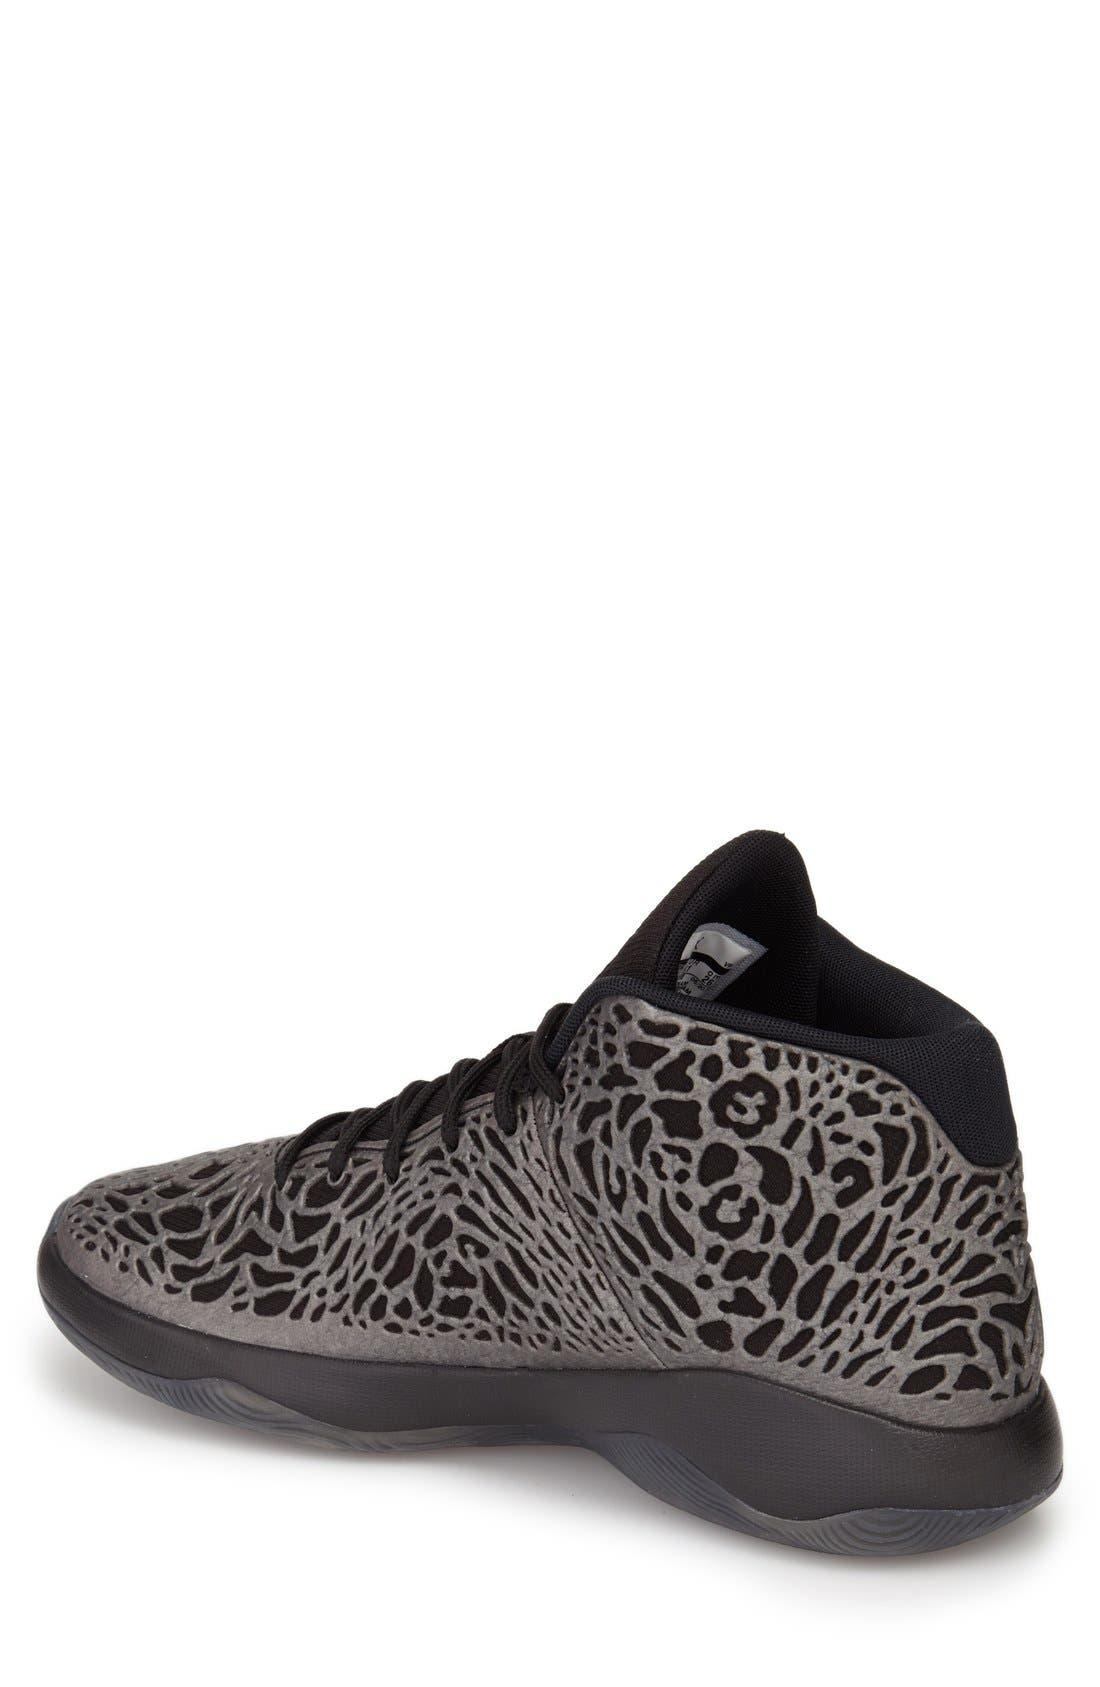 Alternate Image 2  - Nike Jordan Ultra.Fly High Top Sneaker (Men)